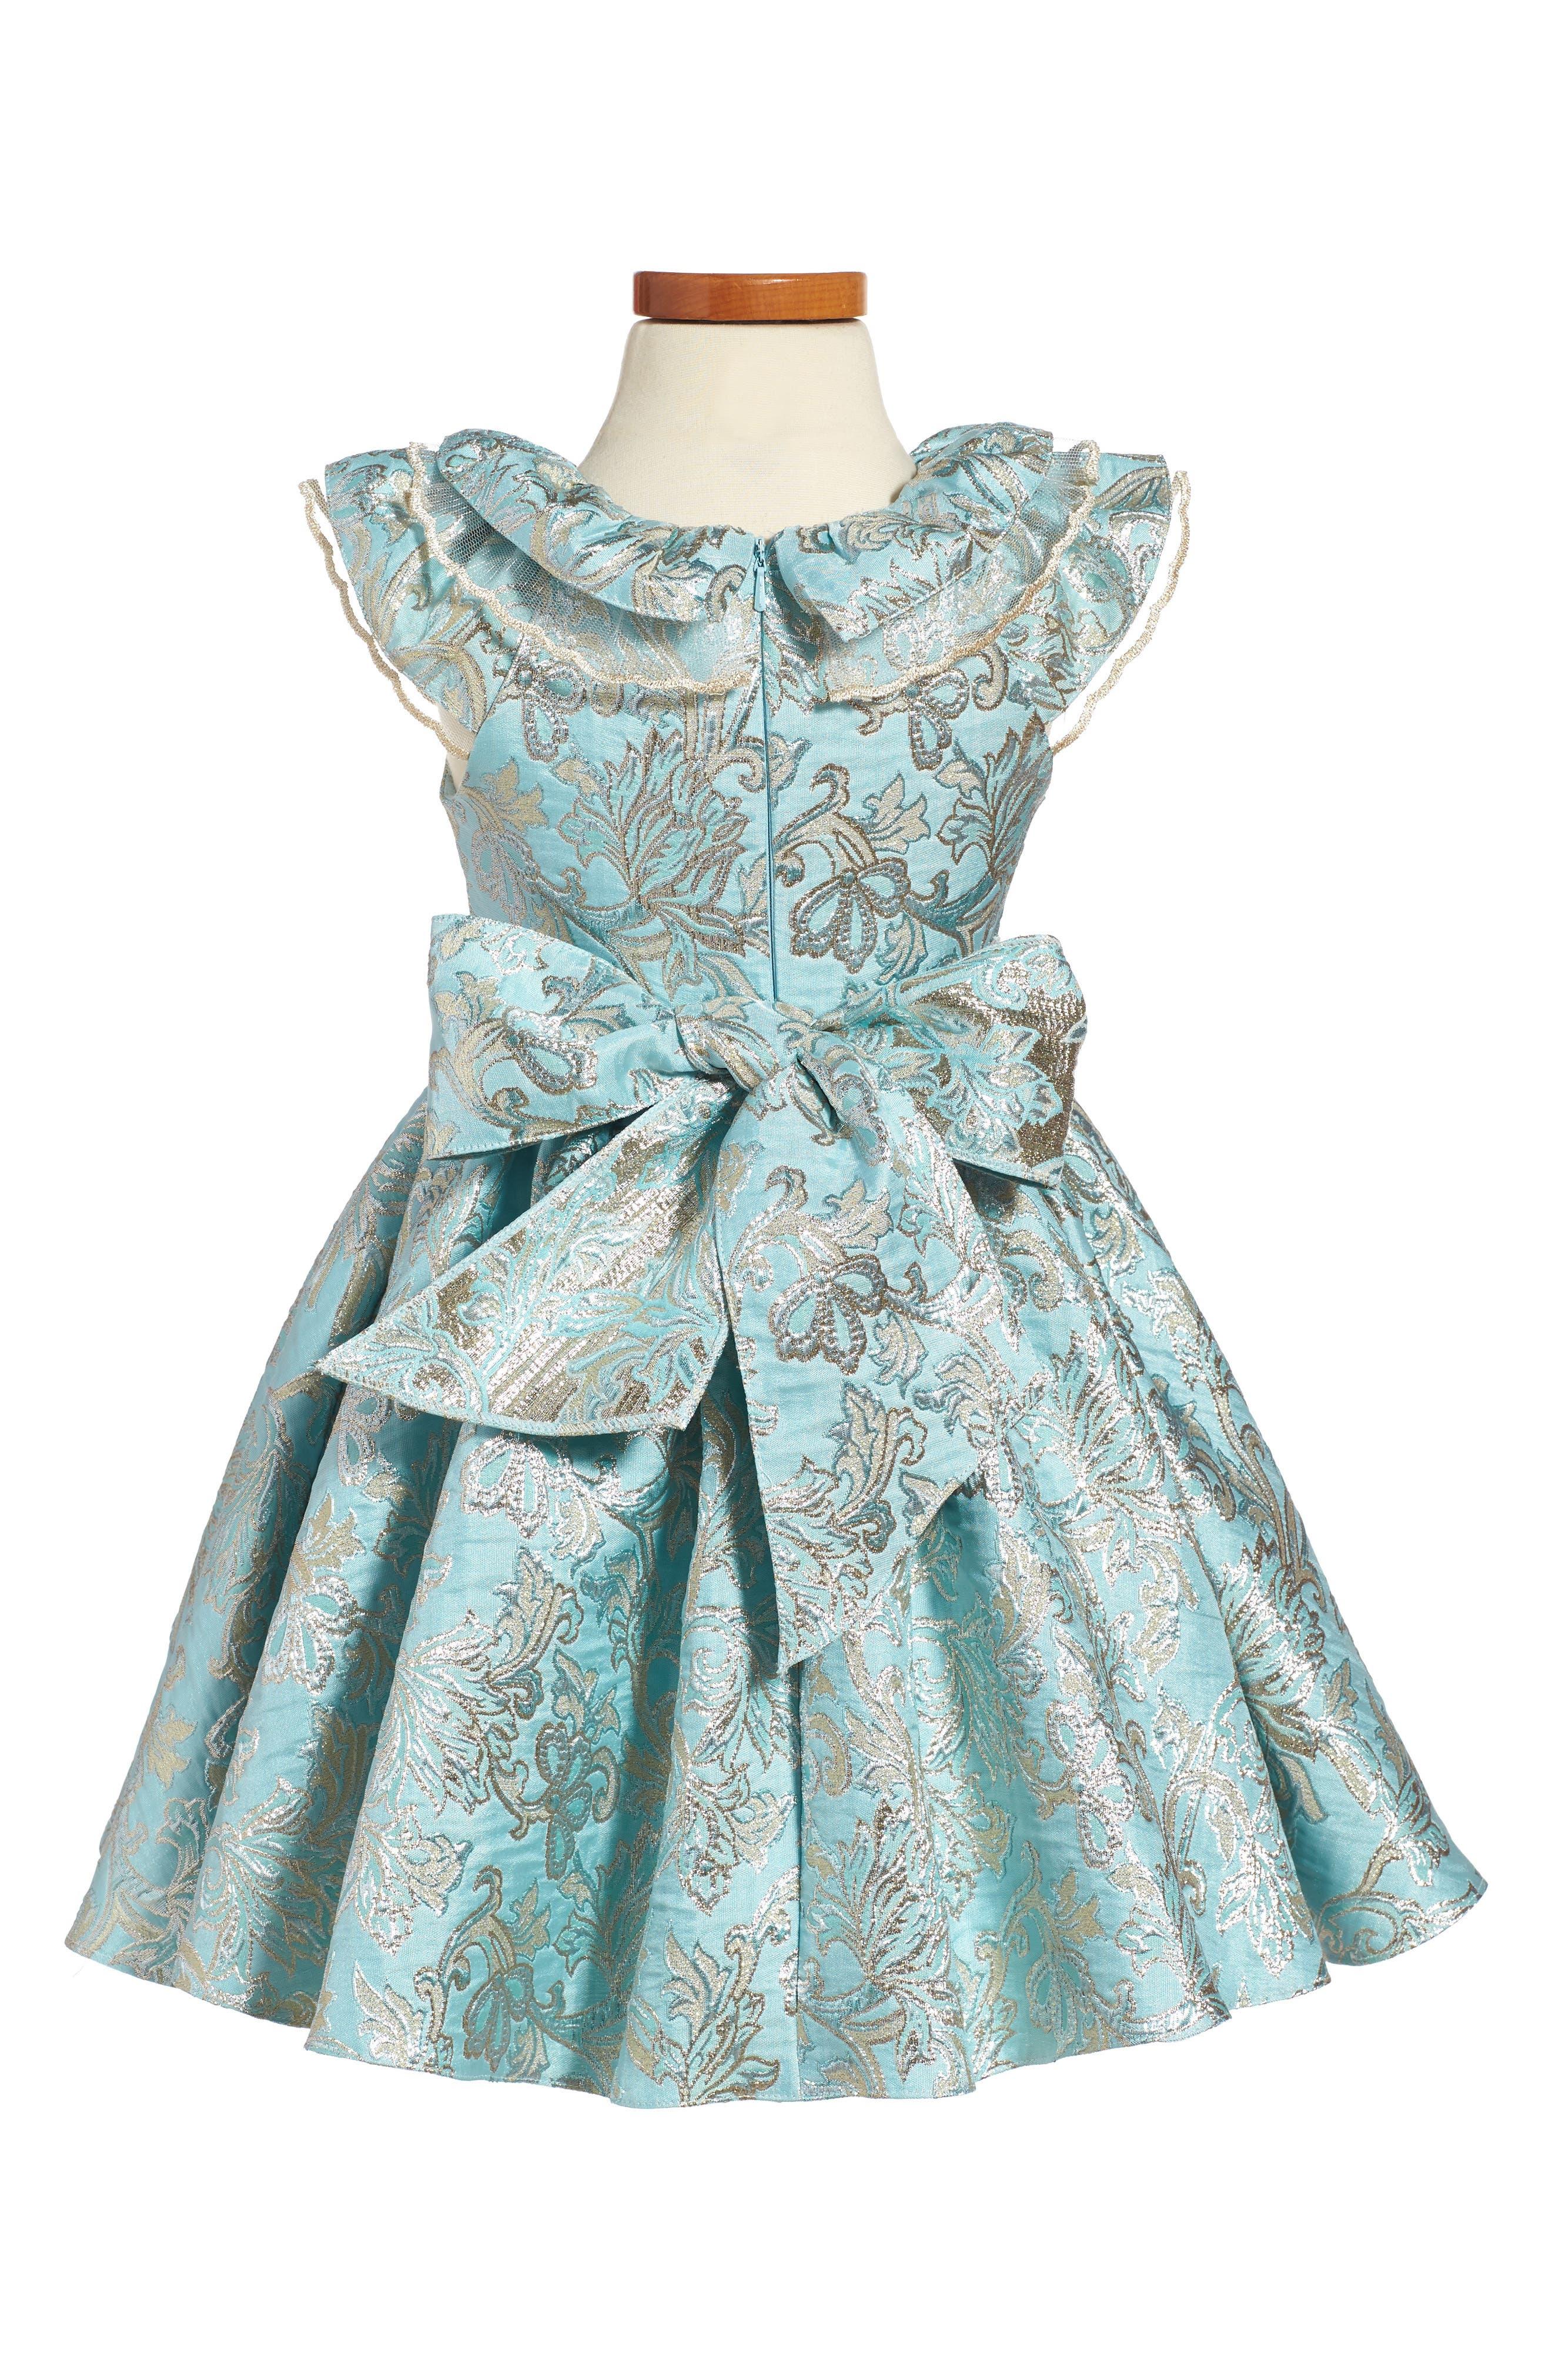 David Chales Ruffle Neck Brocade Dress,                             Alternate thumbnail 3, color,                             440